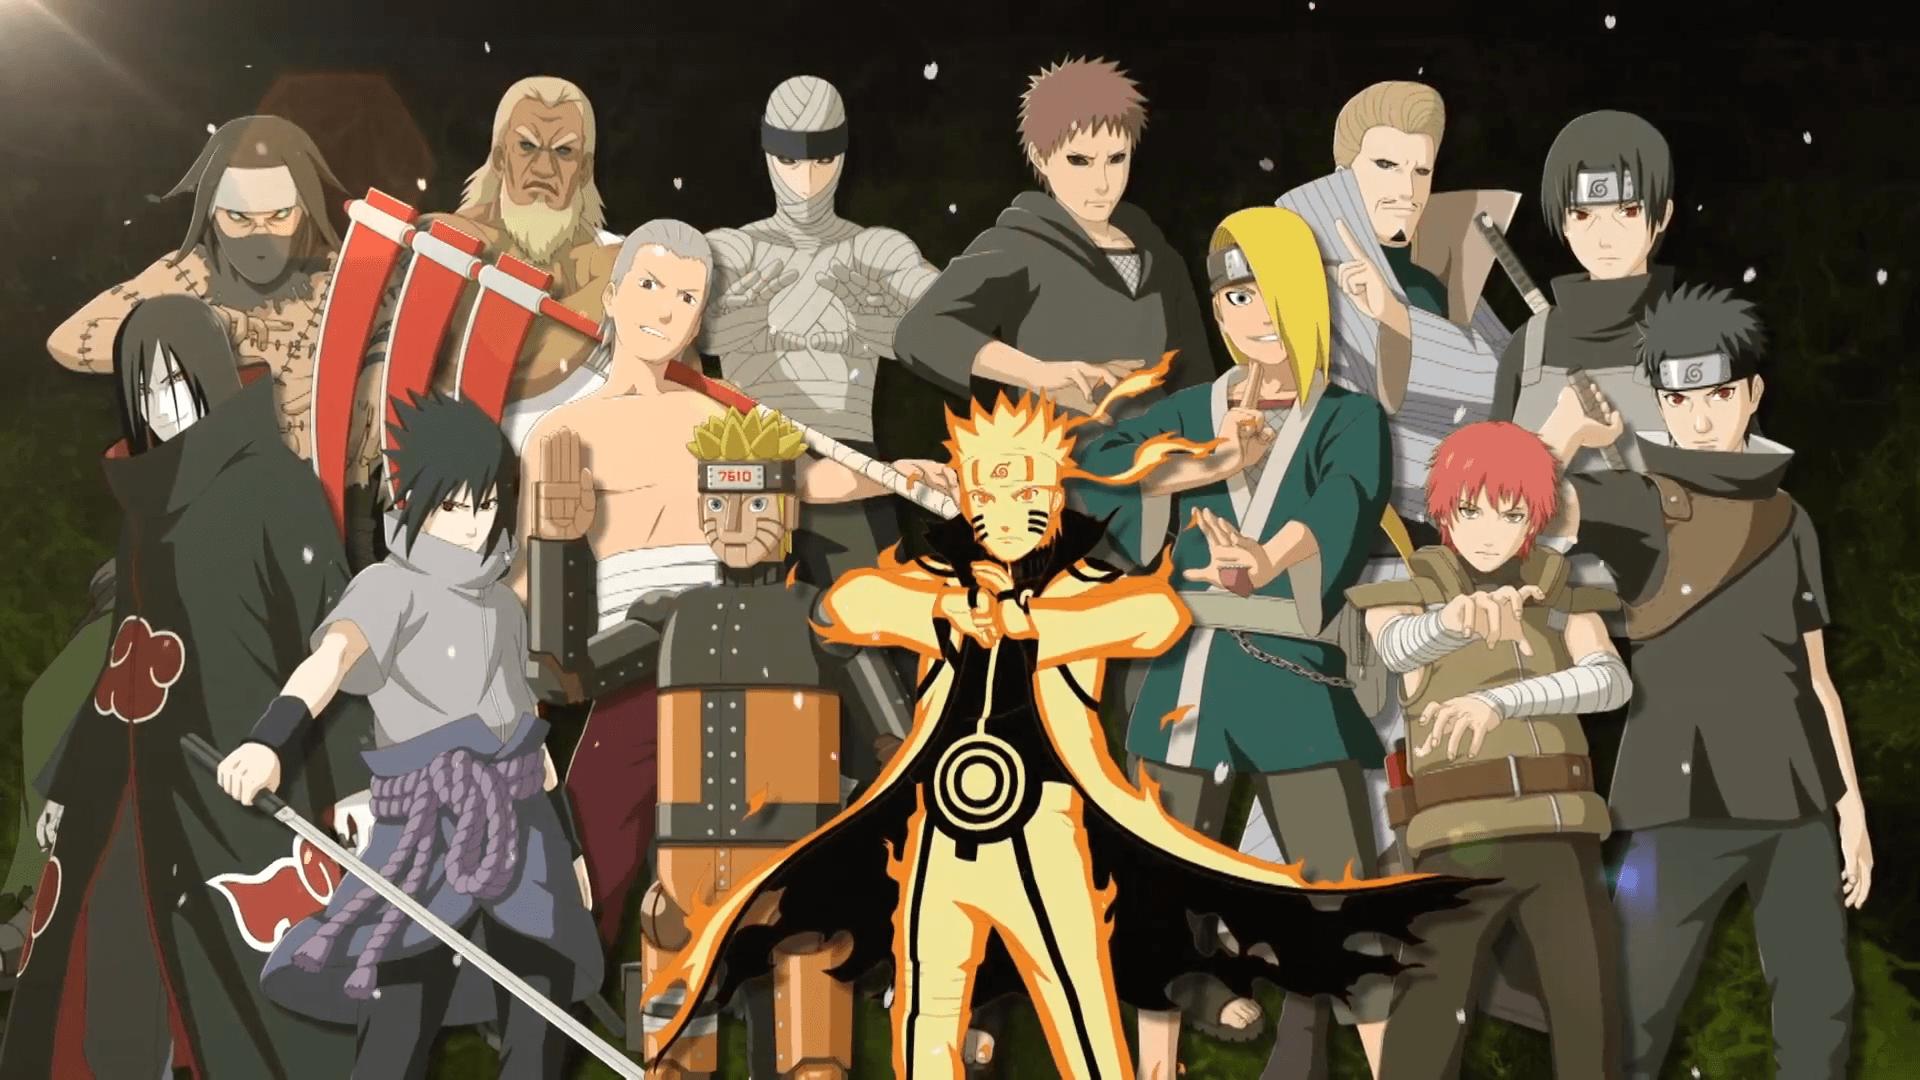 Naruto Shippuden All Characters Wallpapers Top Free Naruto Shippuden All Characters Backgrounds Wallpaperaccess